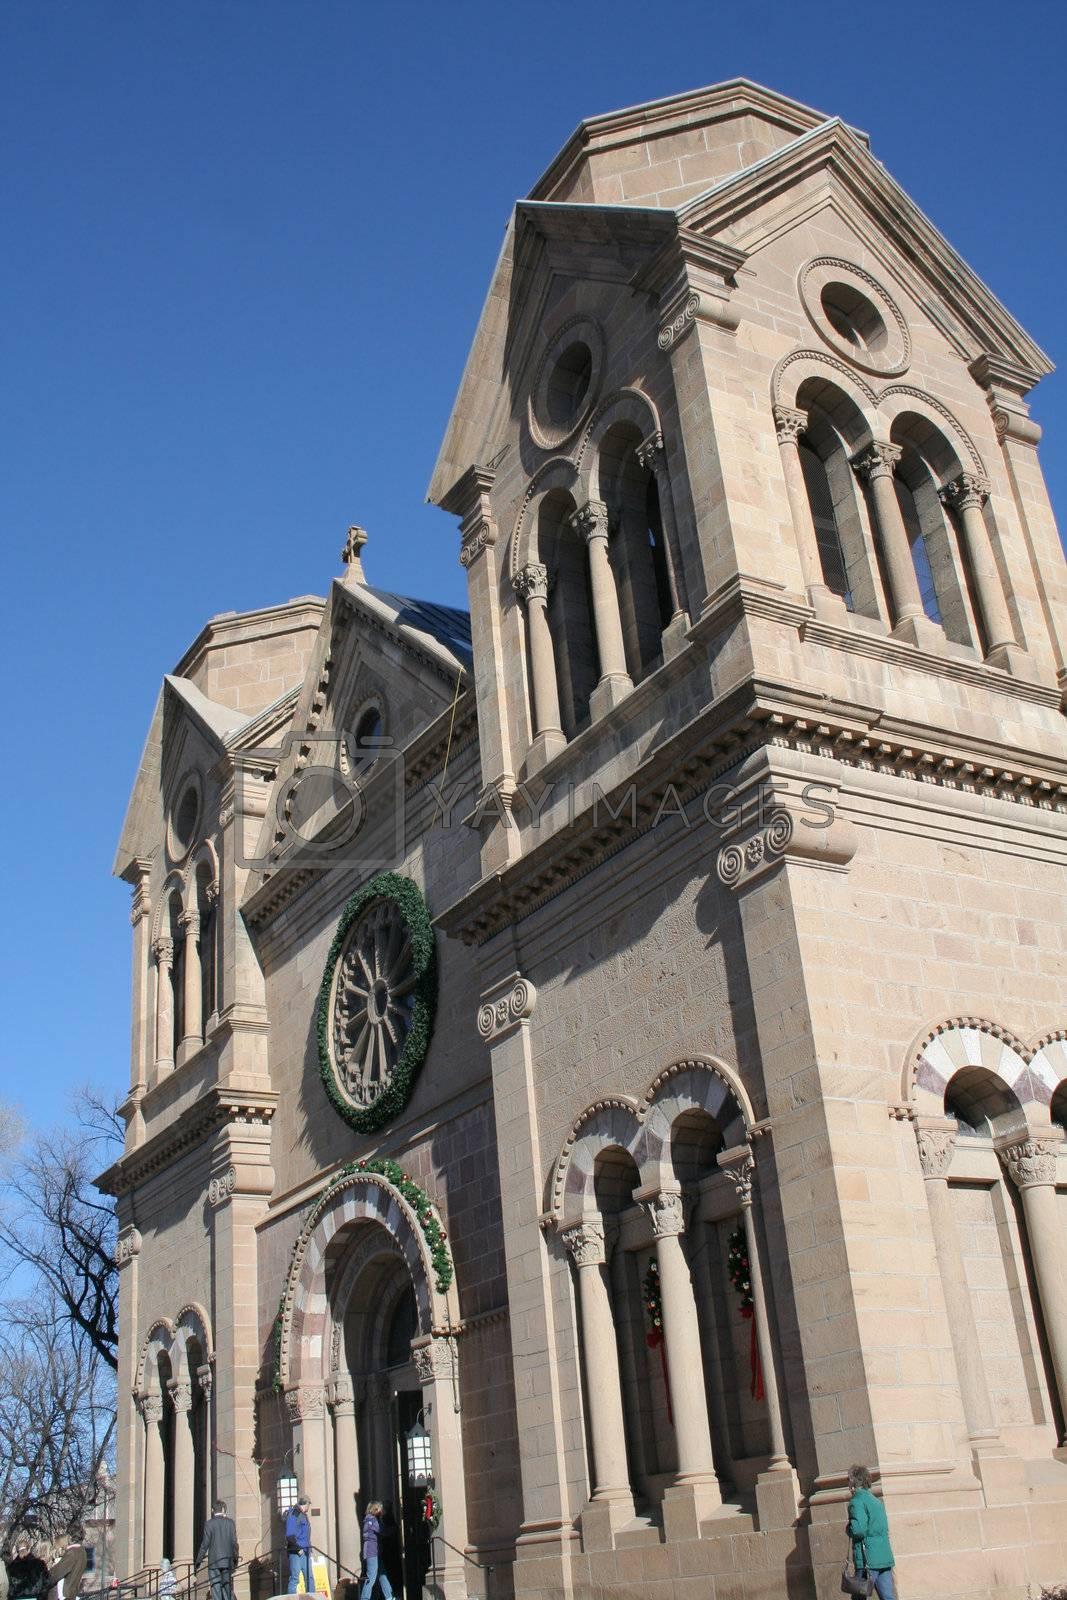 Old Santa Fe church downtown